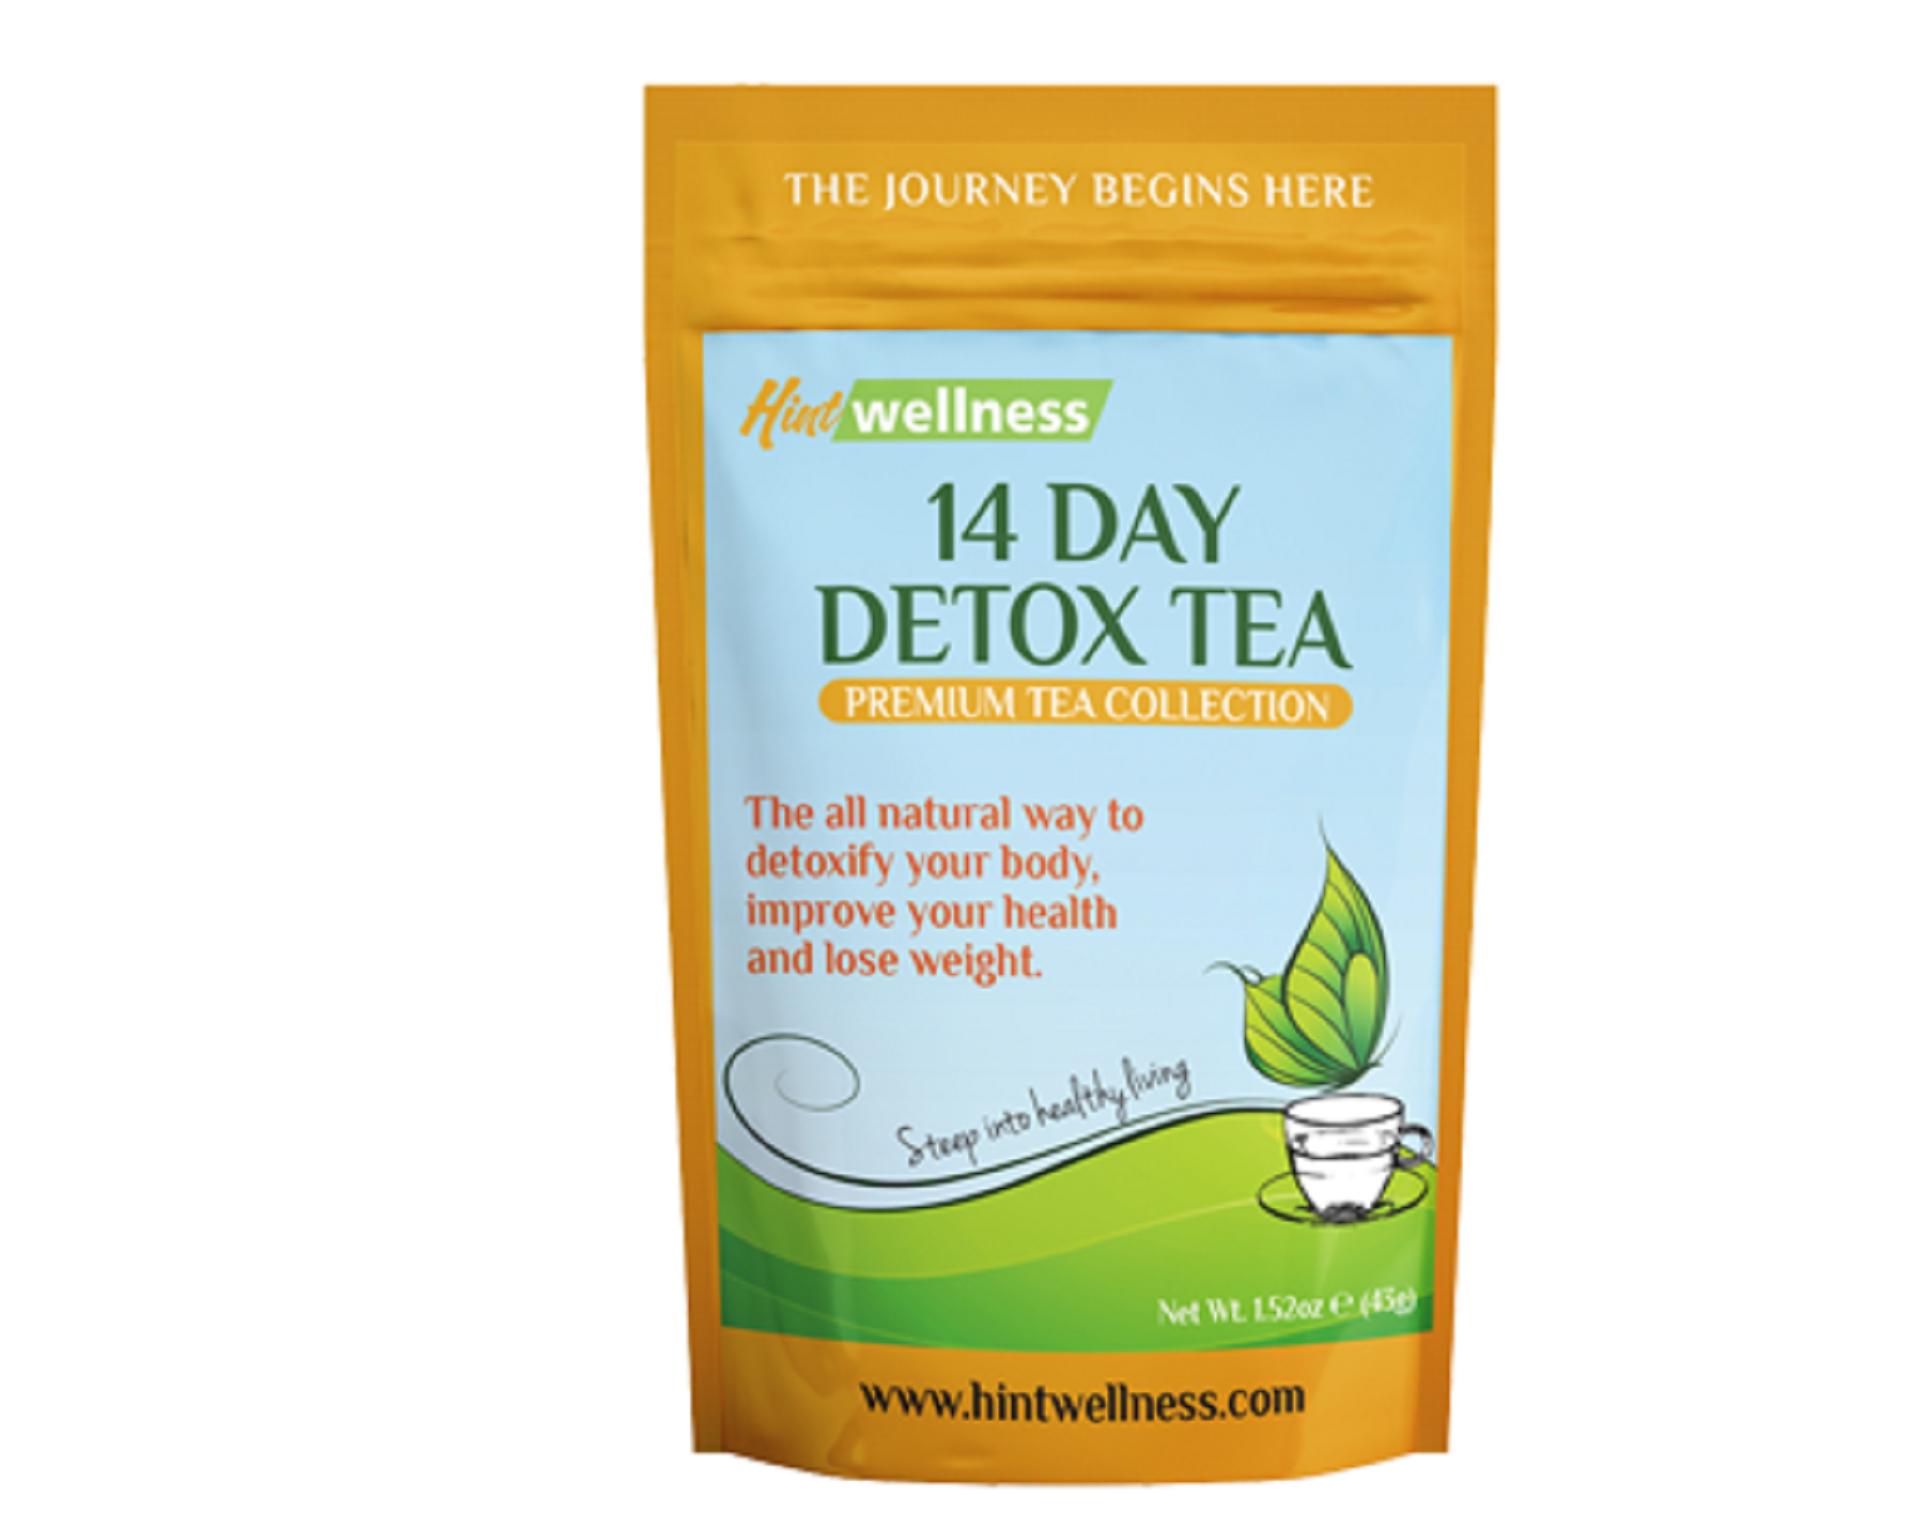 hint wellness 14 day detox tea